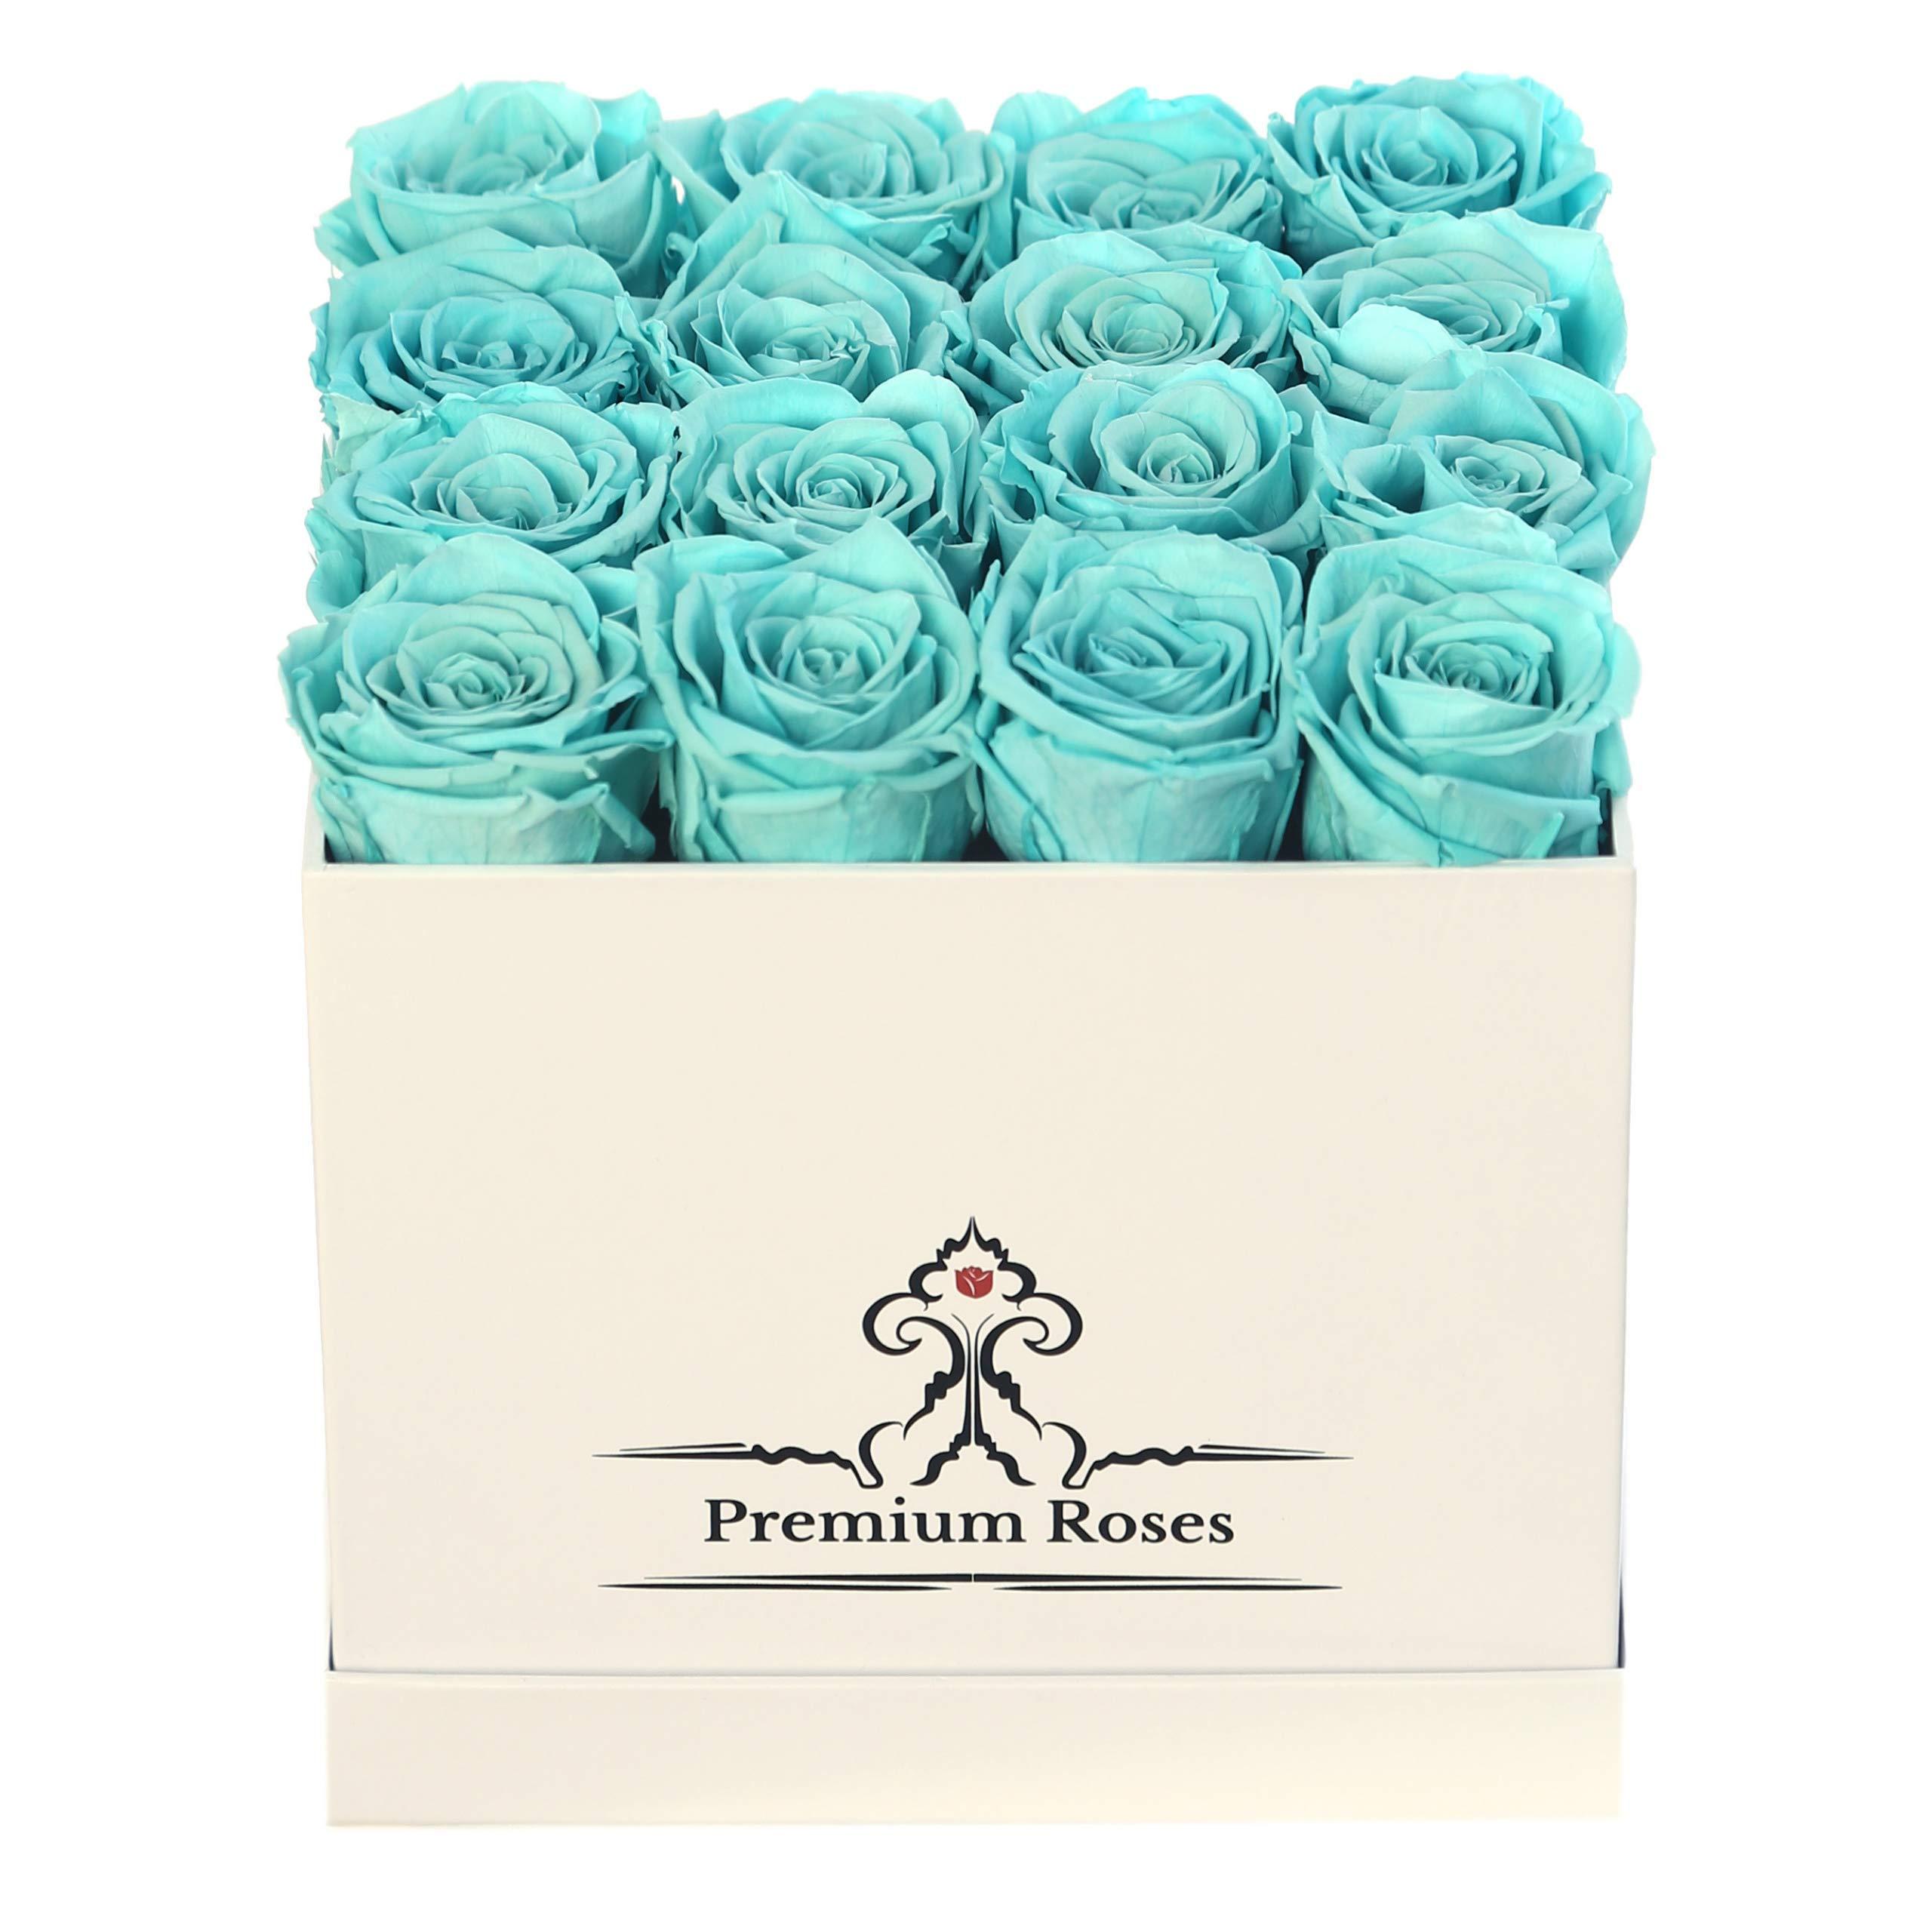 Premium Roses | Model White| Real Roses That Last 365 Days | Fresh Flowers| Roses in a Box (White Box, Medium)